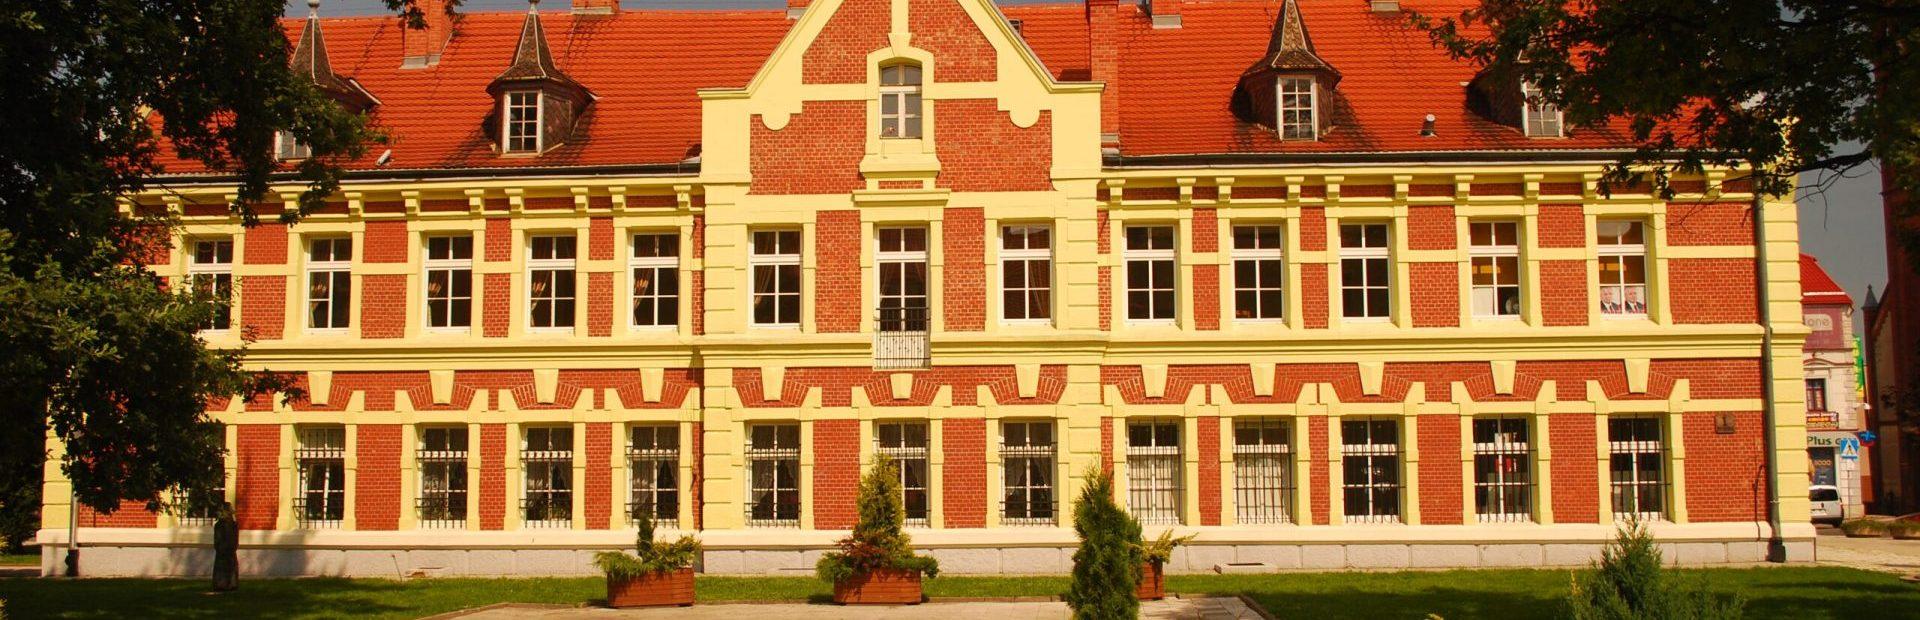 Starogard Gdański